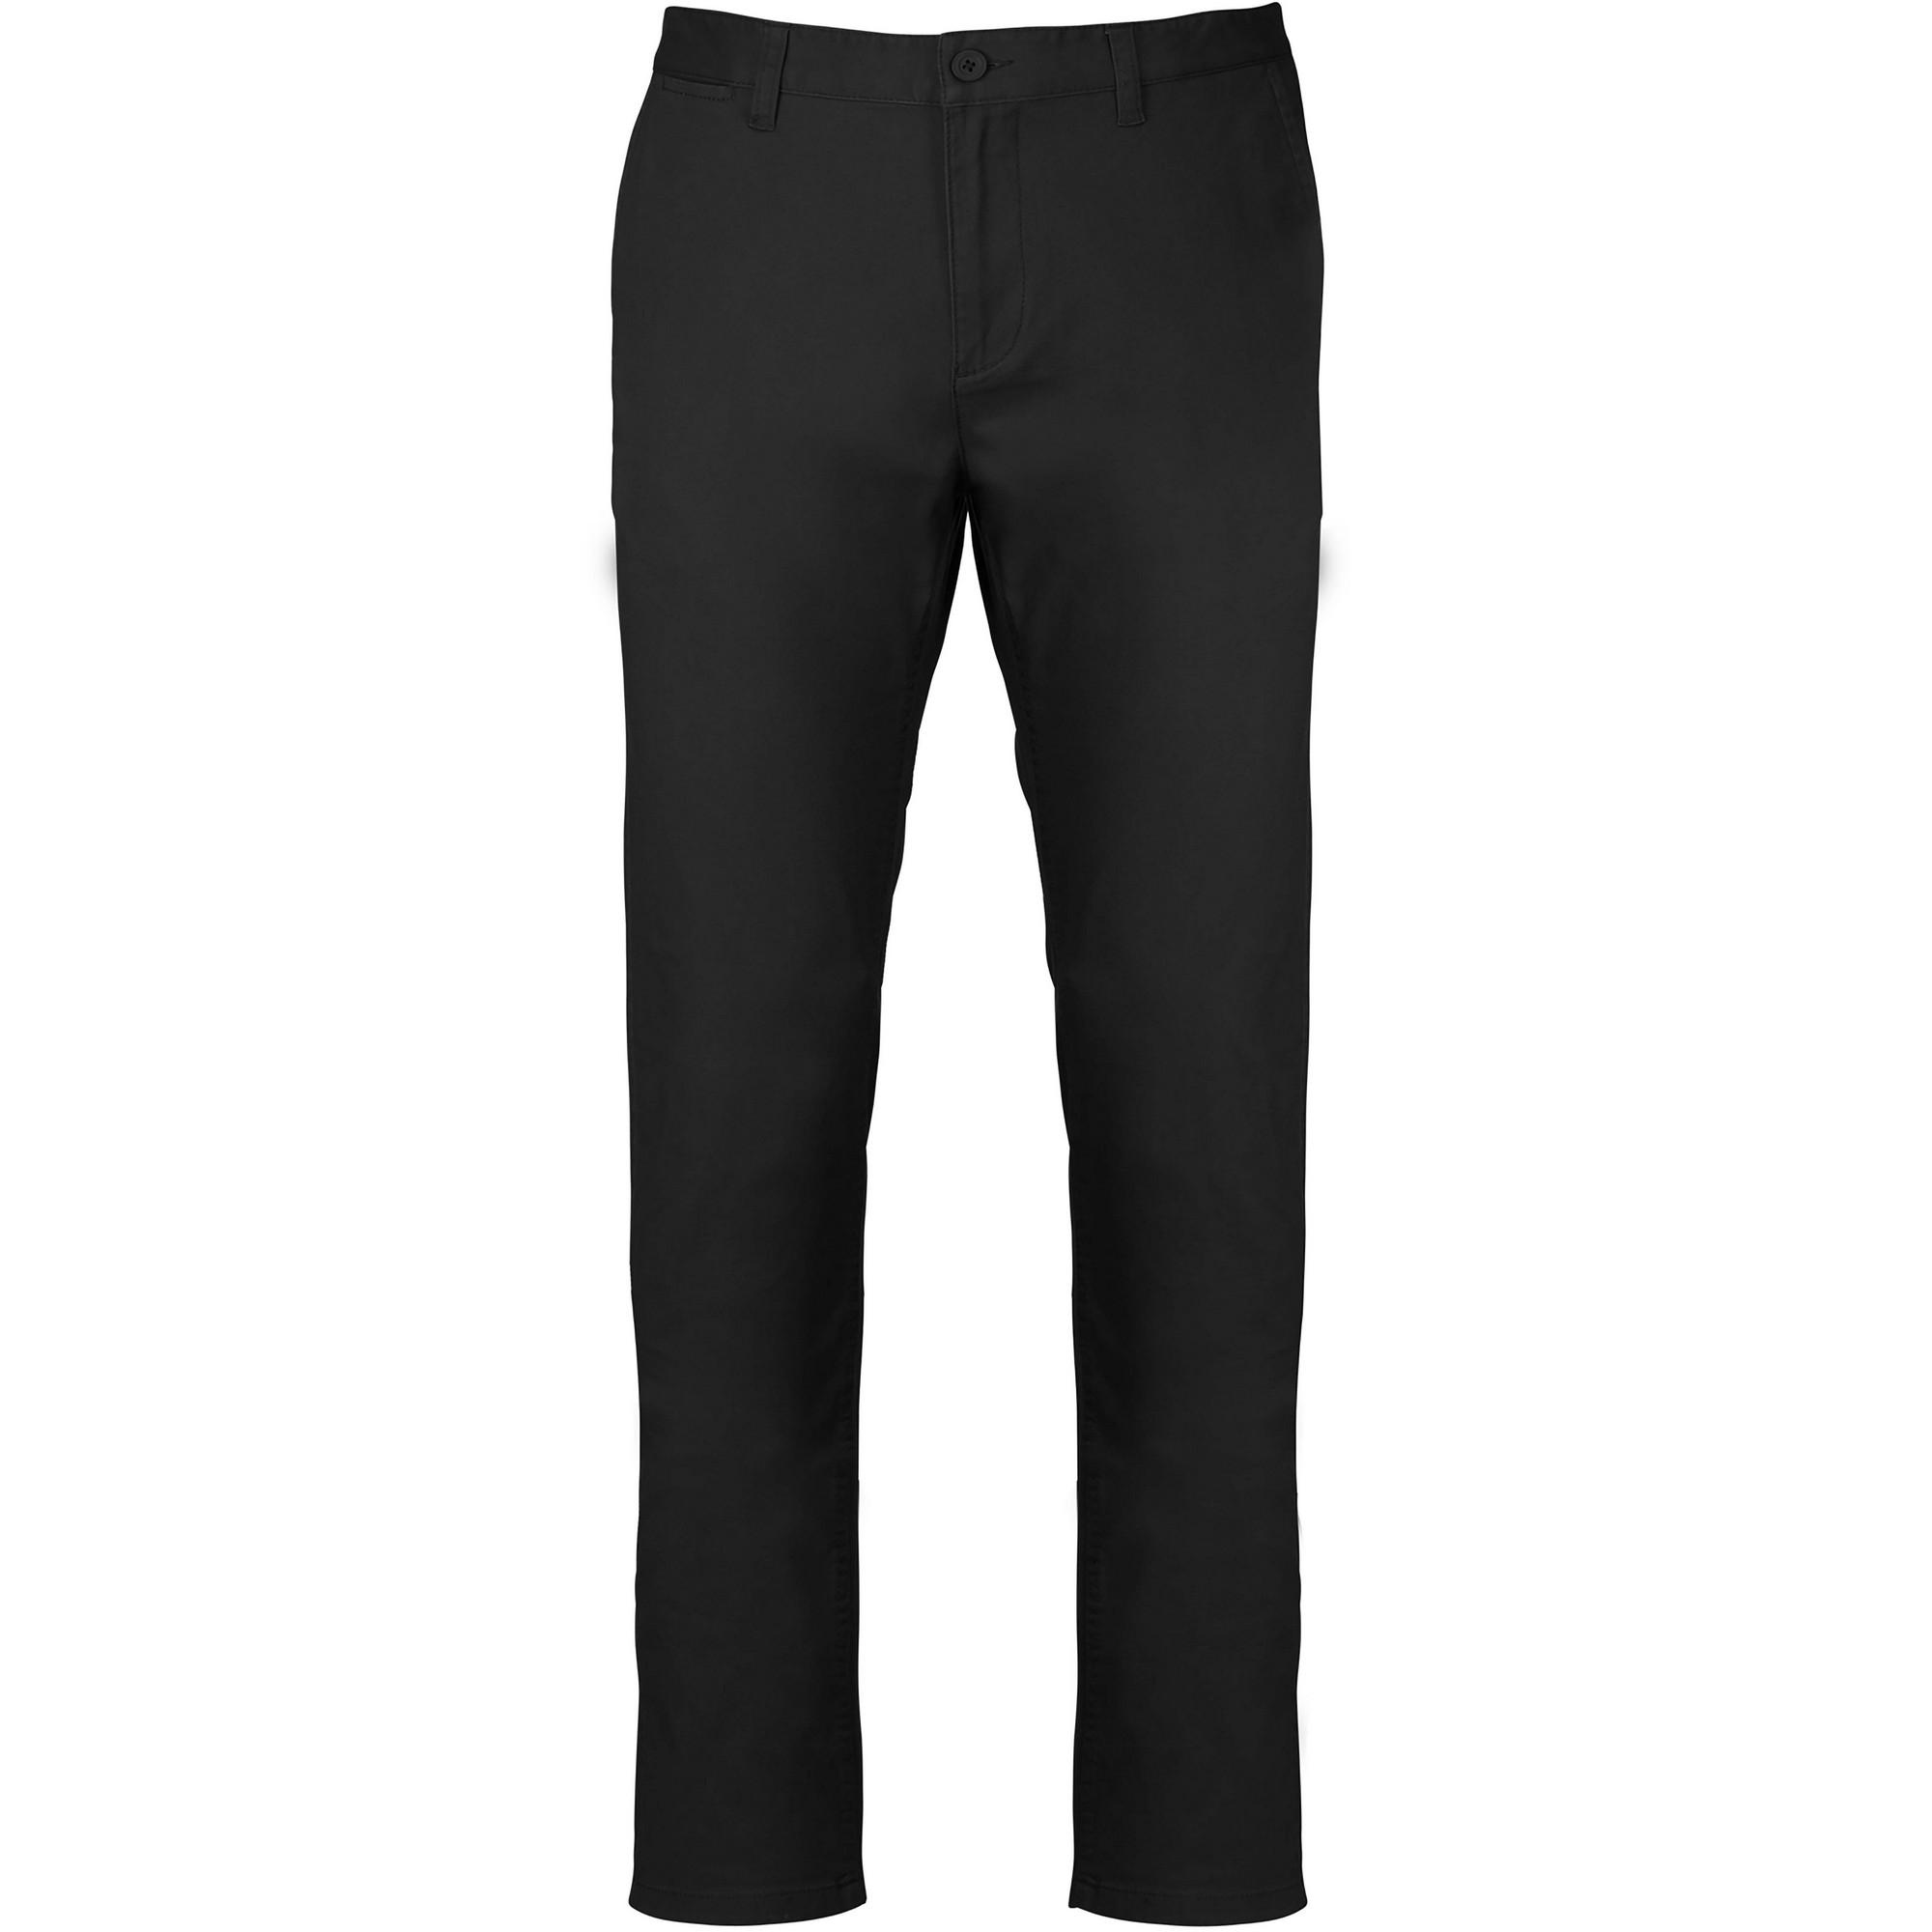 Kariban Mens Chino Trousers (L) (Black)